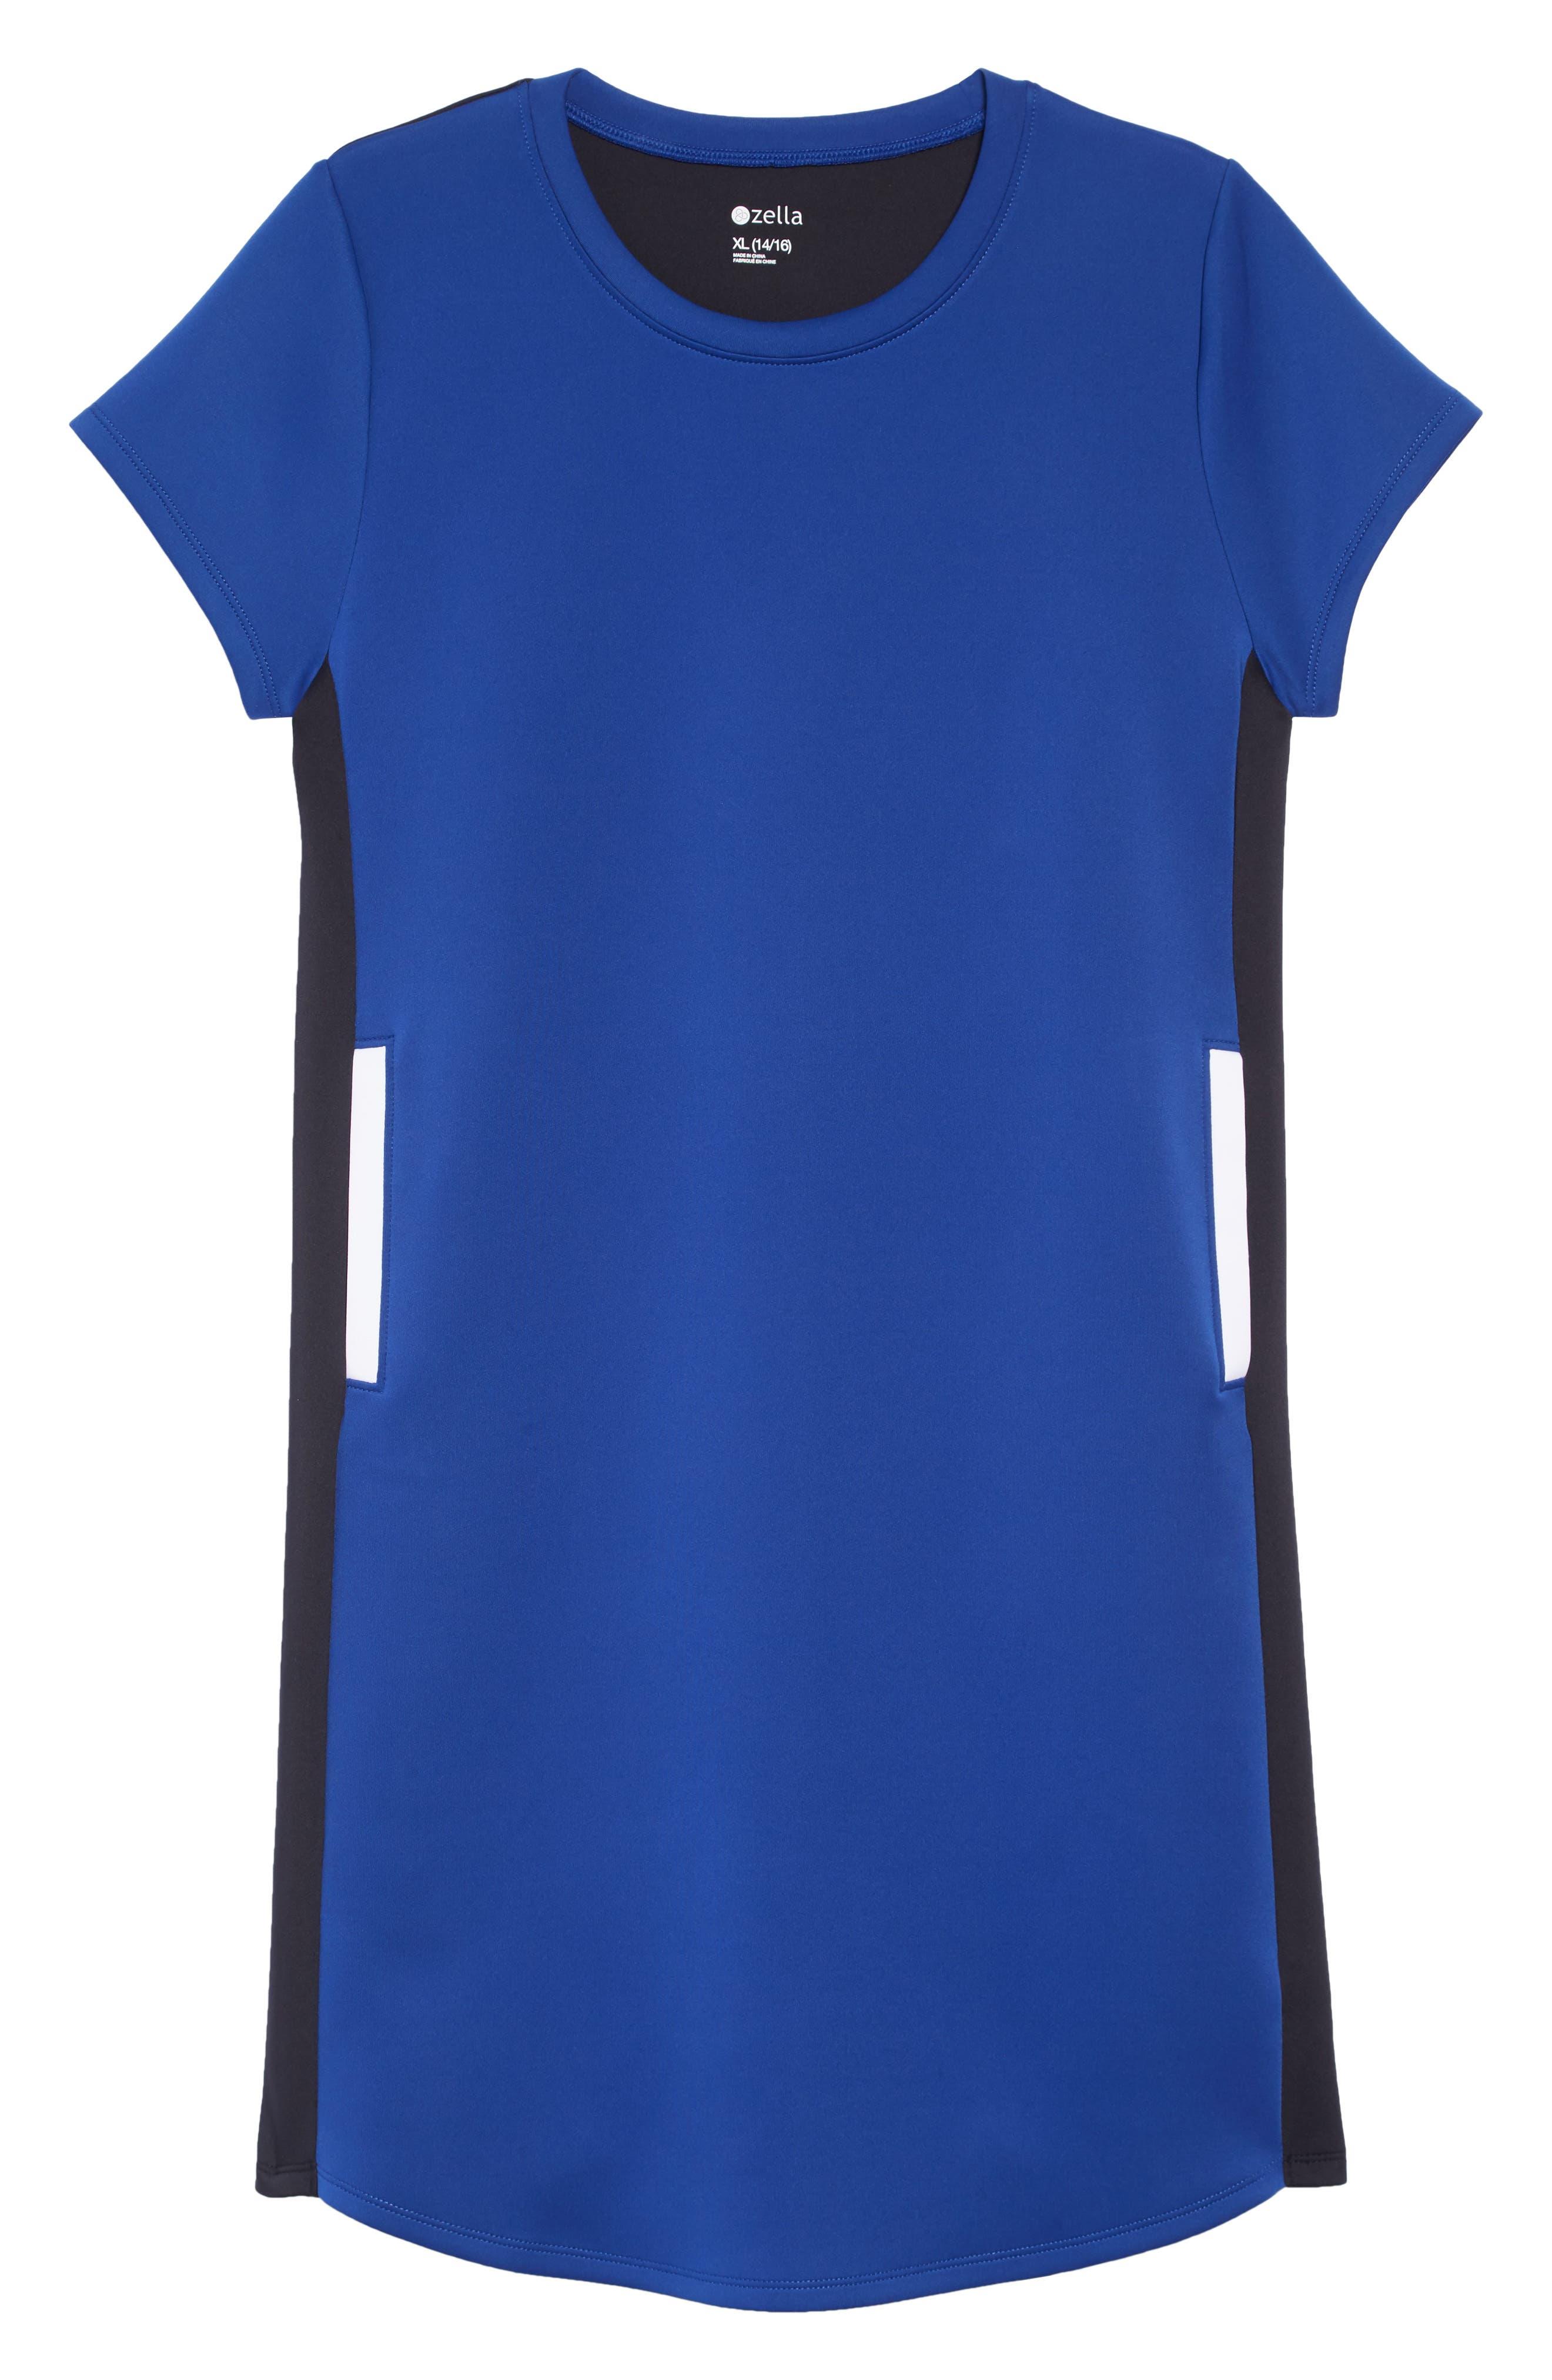 ZELLA GIRL Colorblock Dress, Main, color, 401